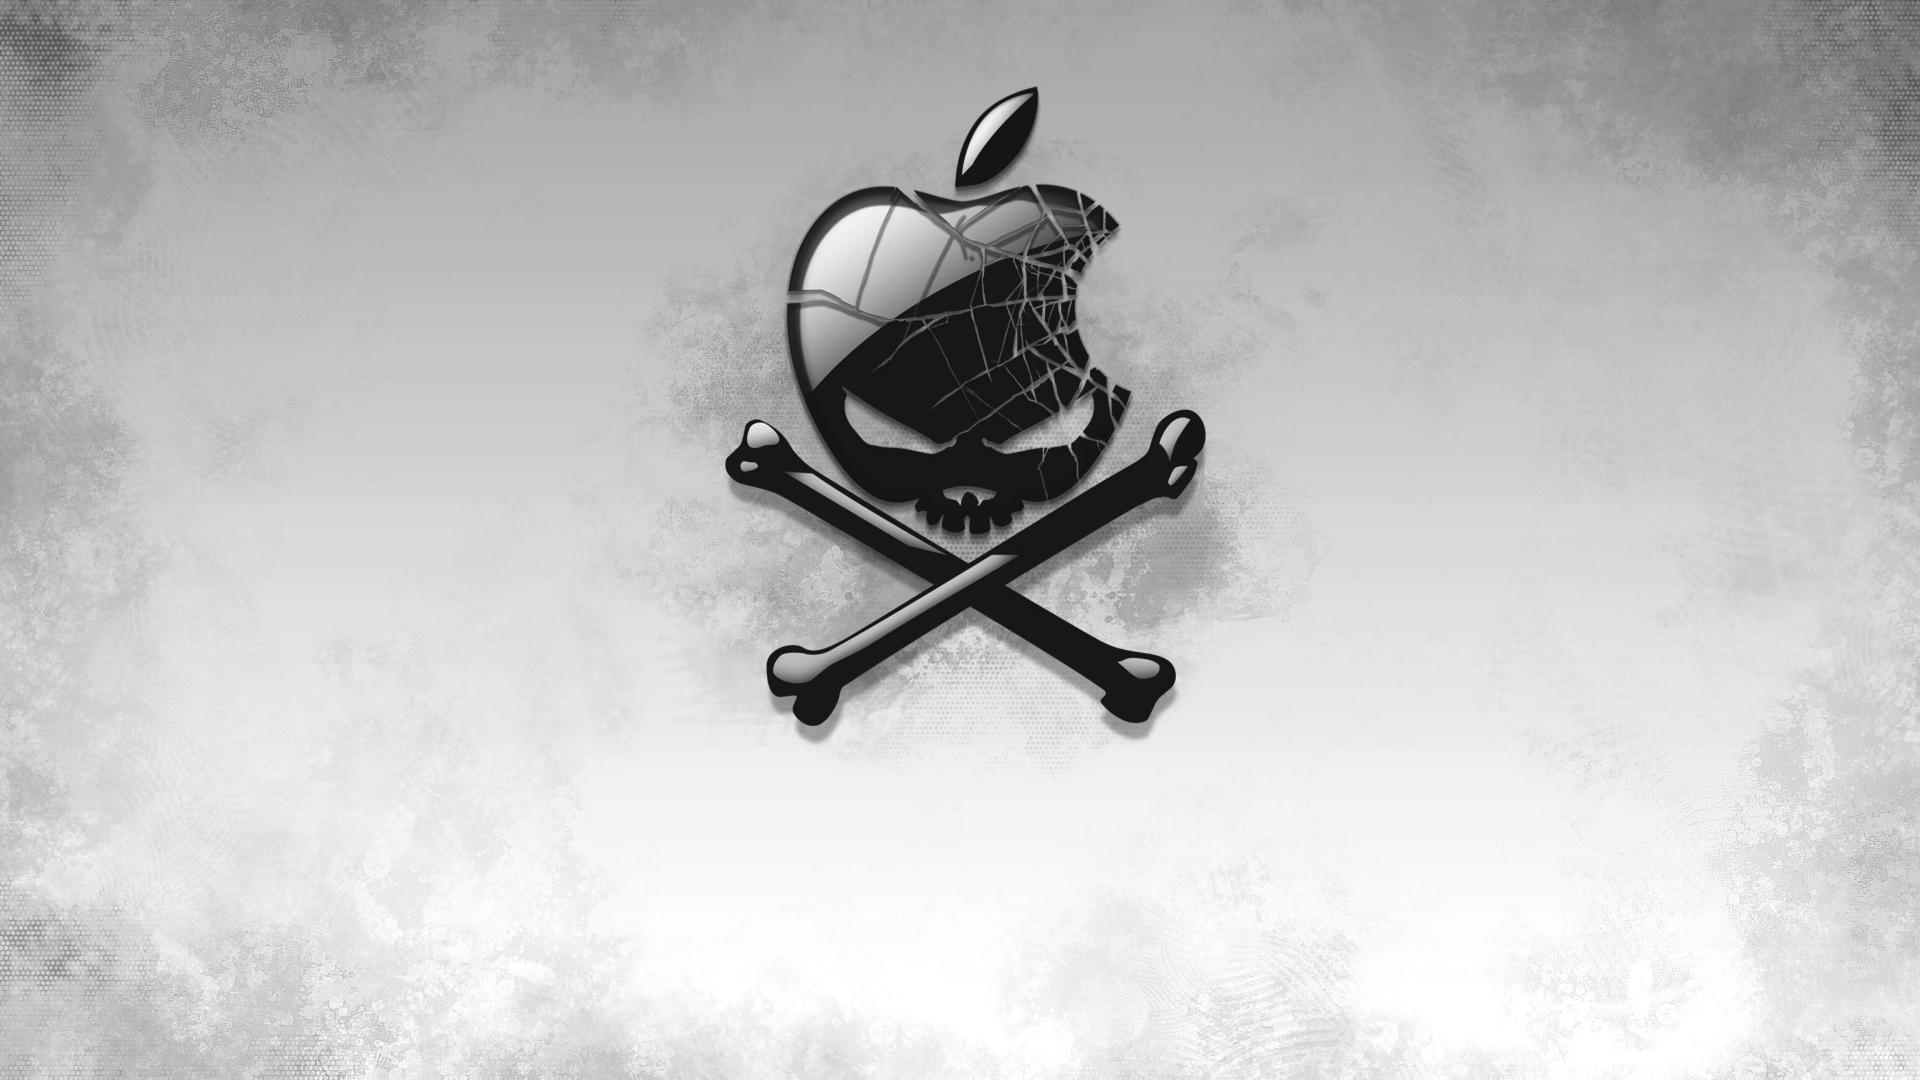 1920x1080 black apple skull laptop full hd 1080p hd 4k wallpapers